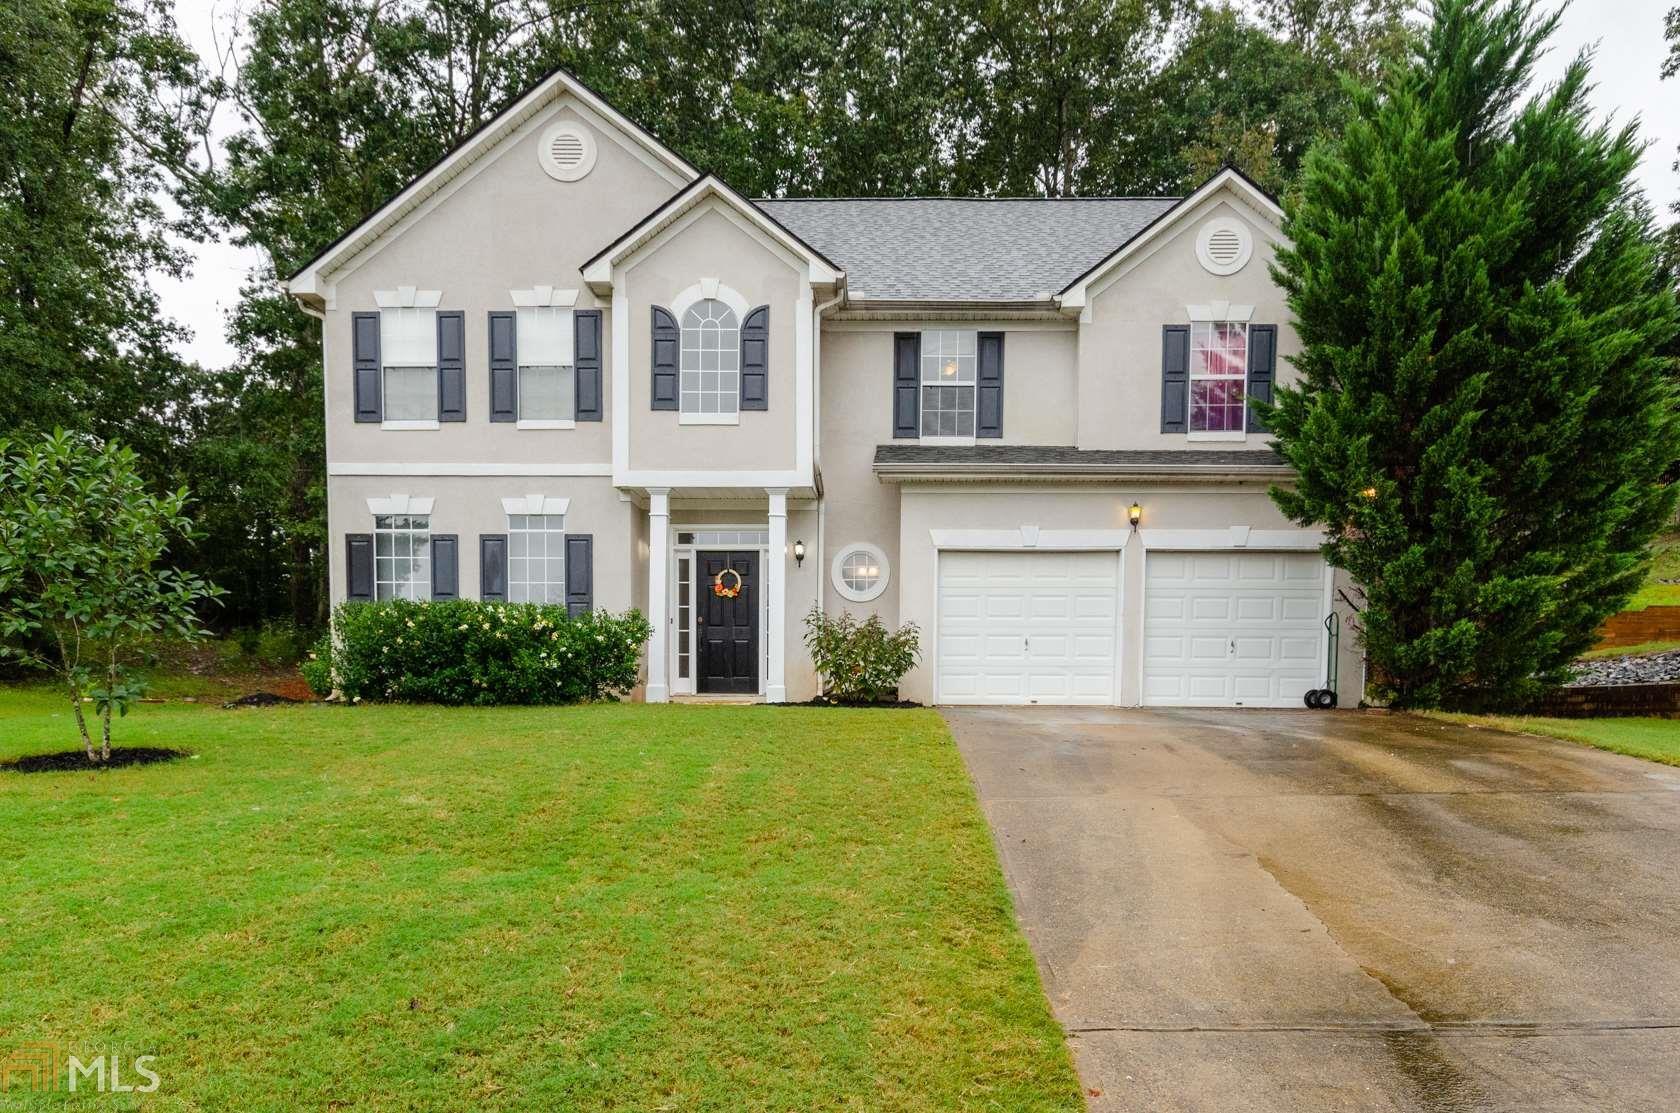 1740 Russells Pond Lane, Lawrenceville, GA 30043 - #: 8865891